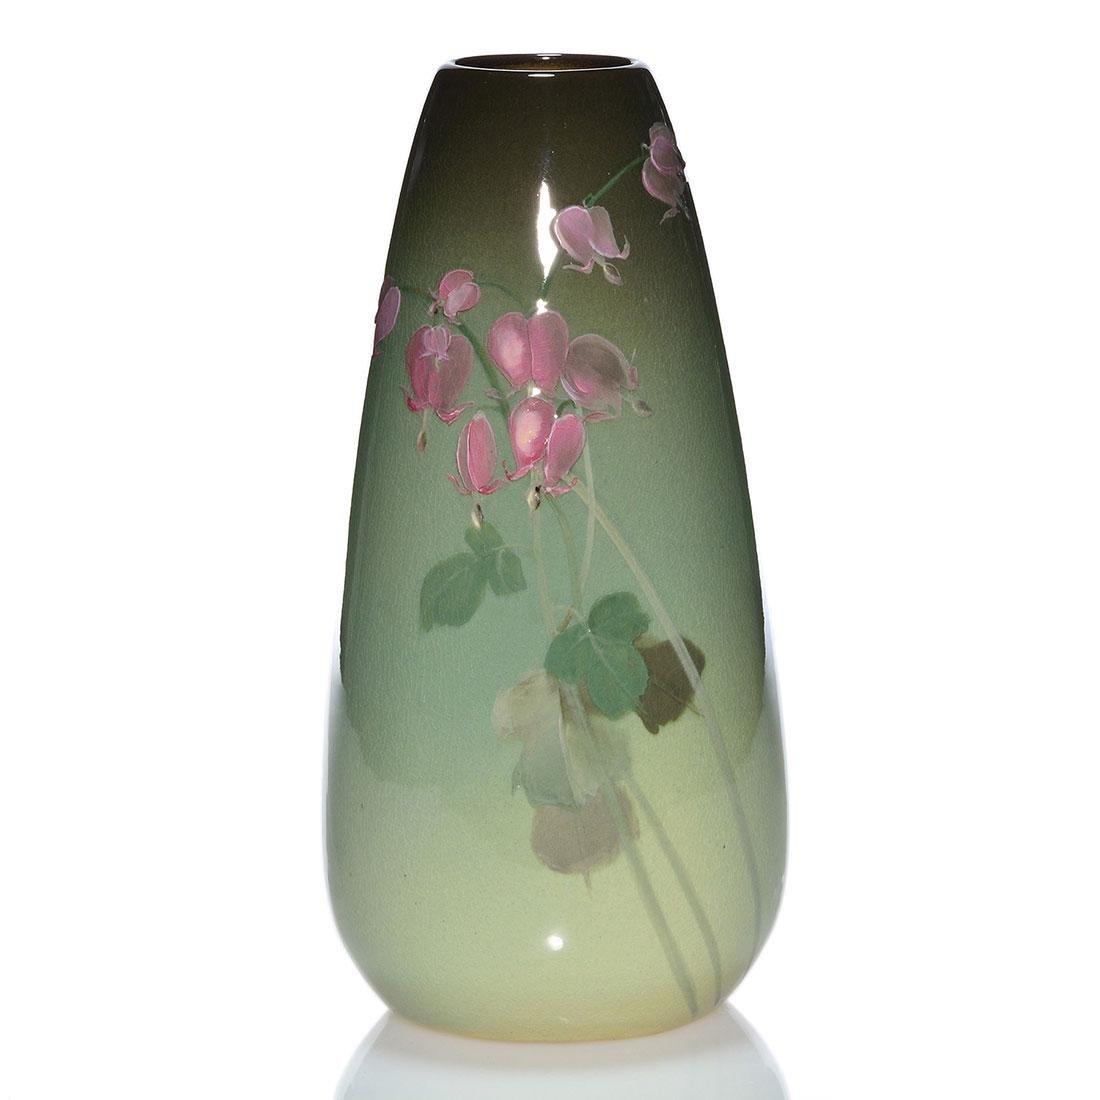 "Weller Eocean vase, Bleeding Hearts, 11 1/4"", artist"